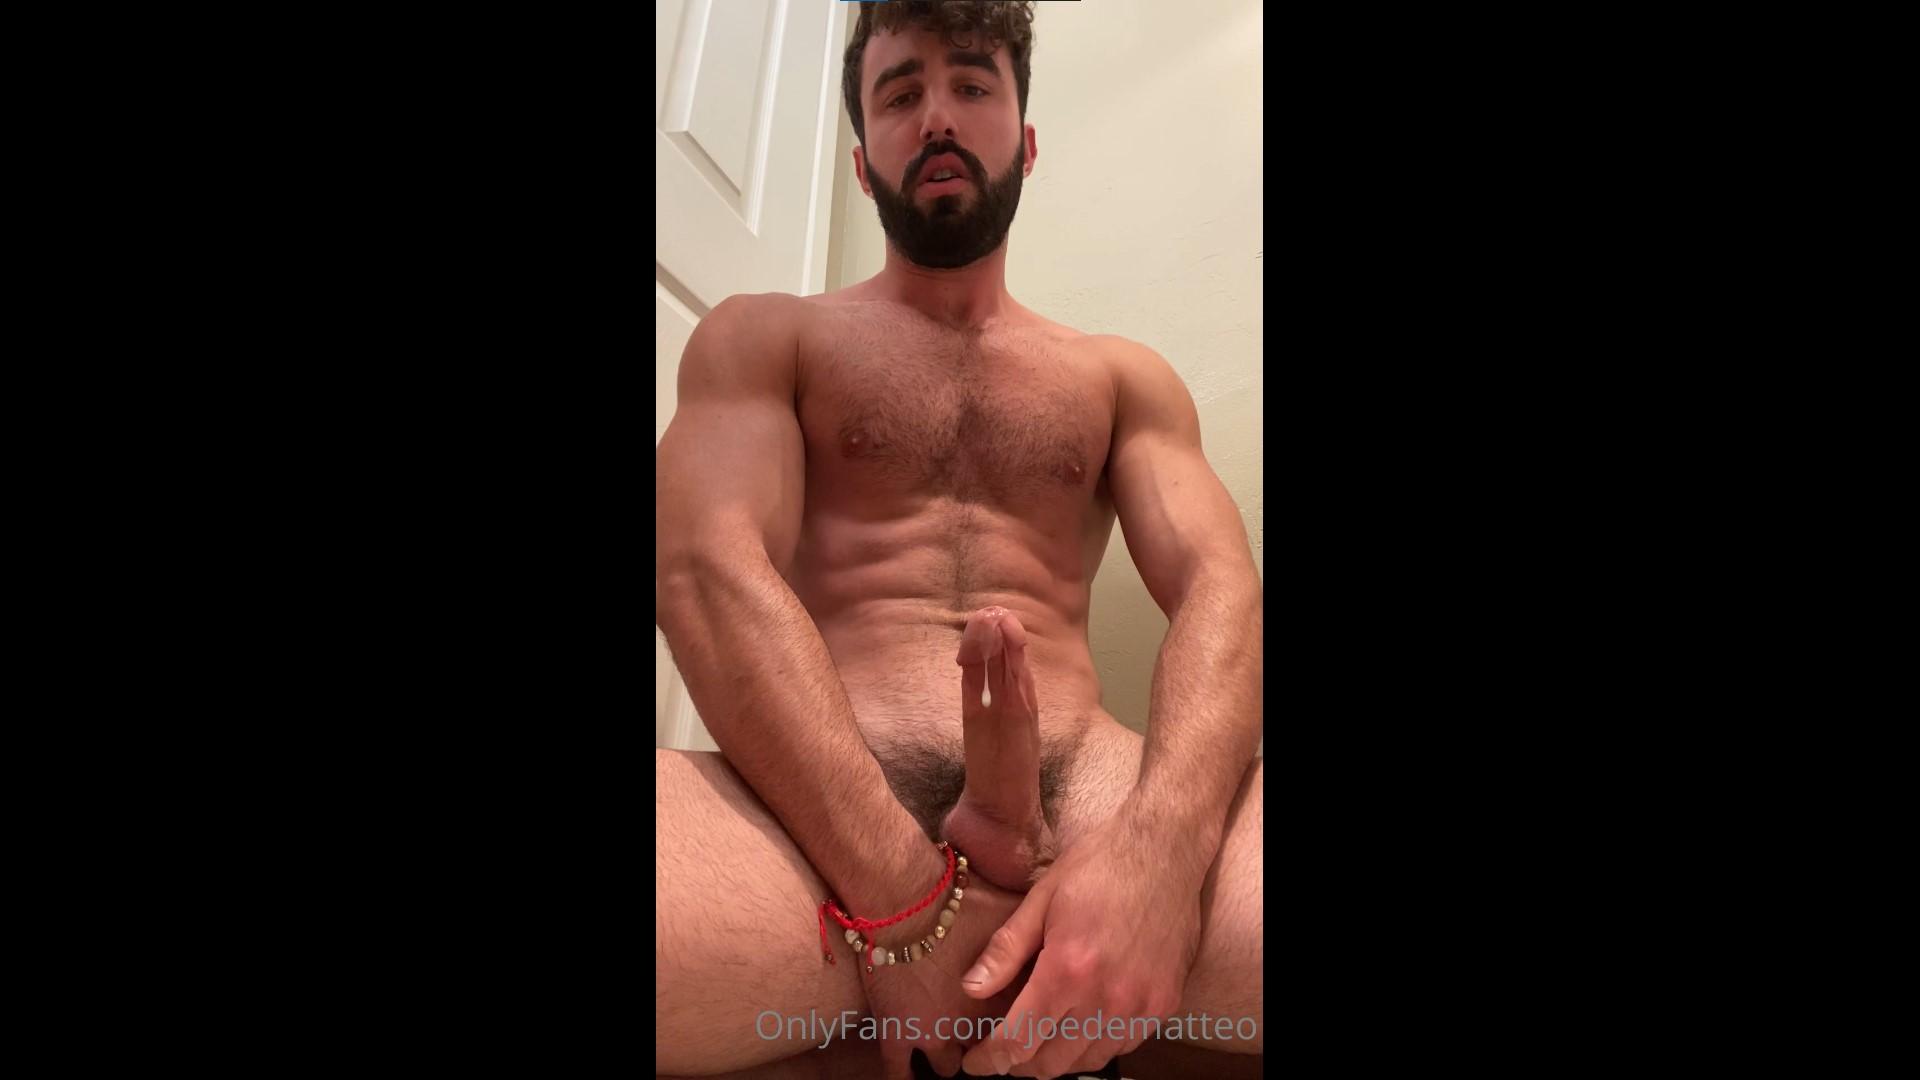 Quick solo jerk off before a shower - Joe DeMatteo